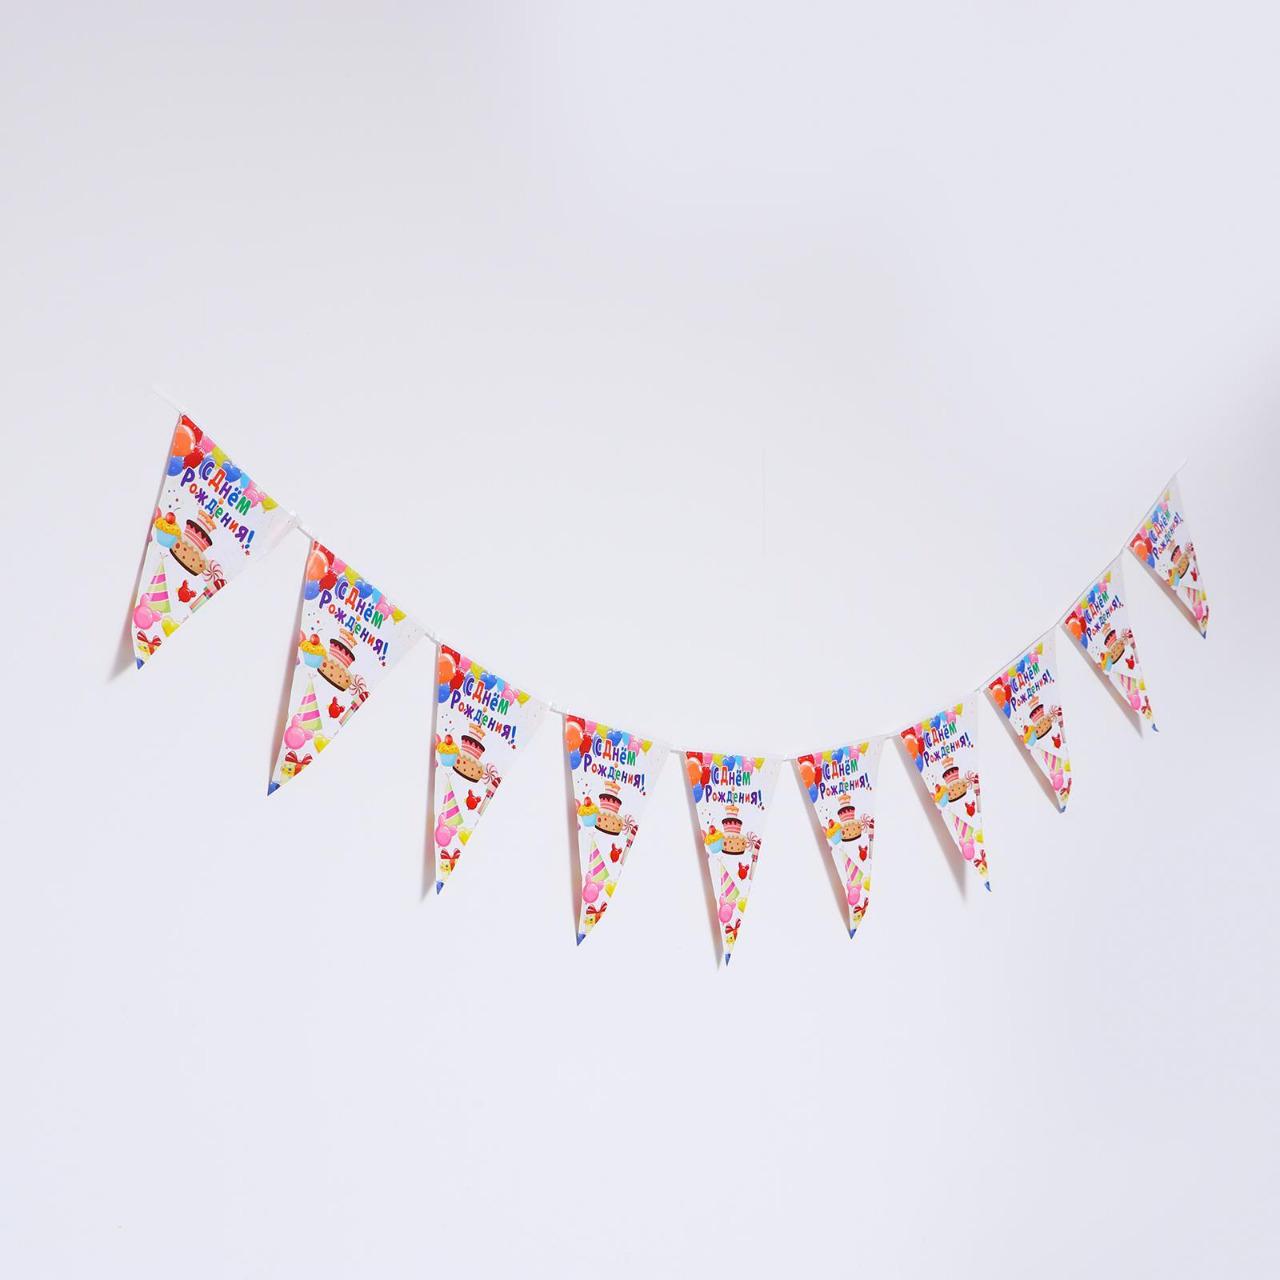 Гирлянда «С днём рождения», 10 флажков